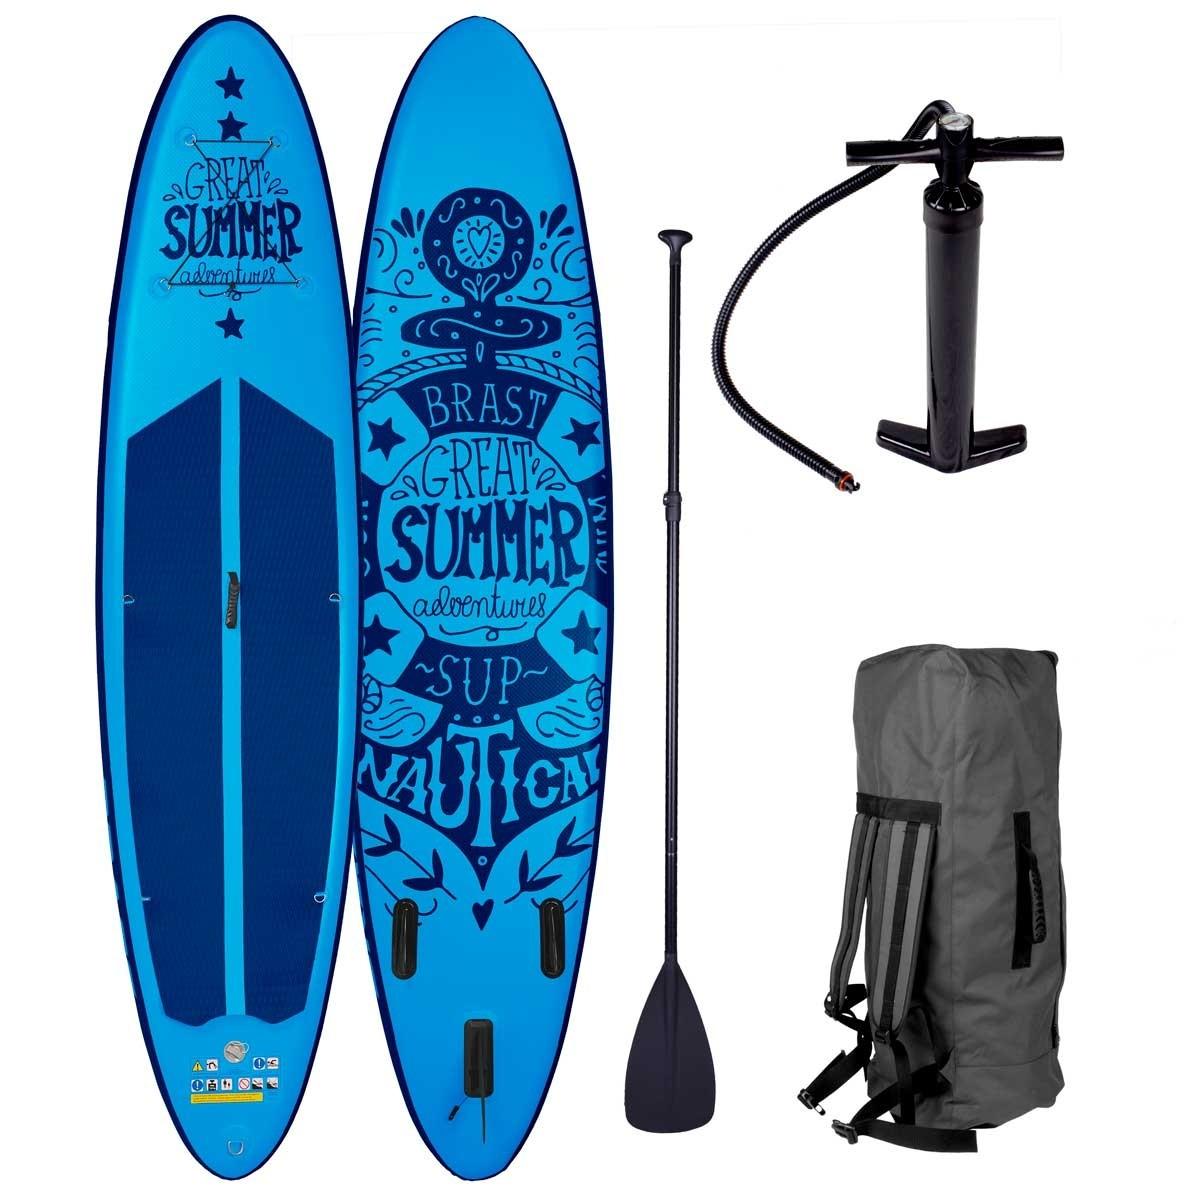 SUP-Board SUMMER 320cm 120kg-Tragkraft inkl. Zubehör